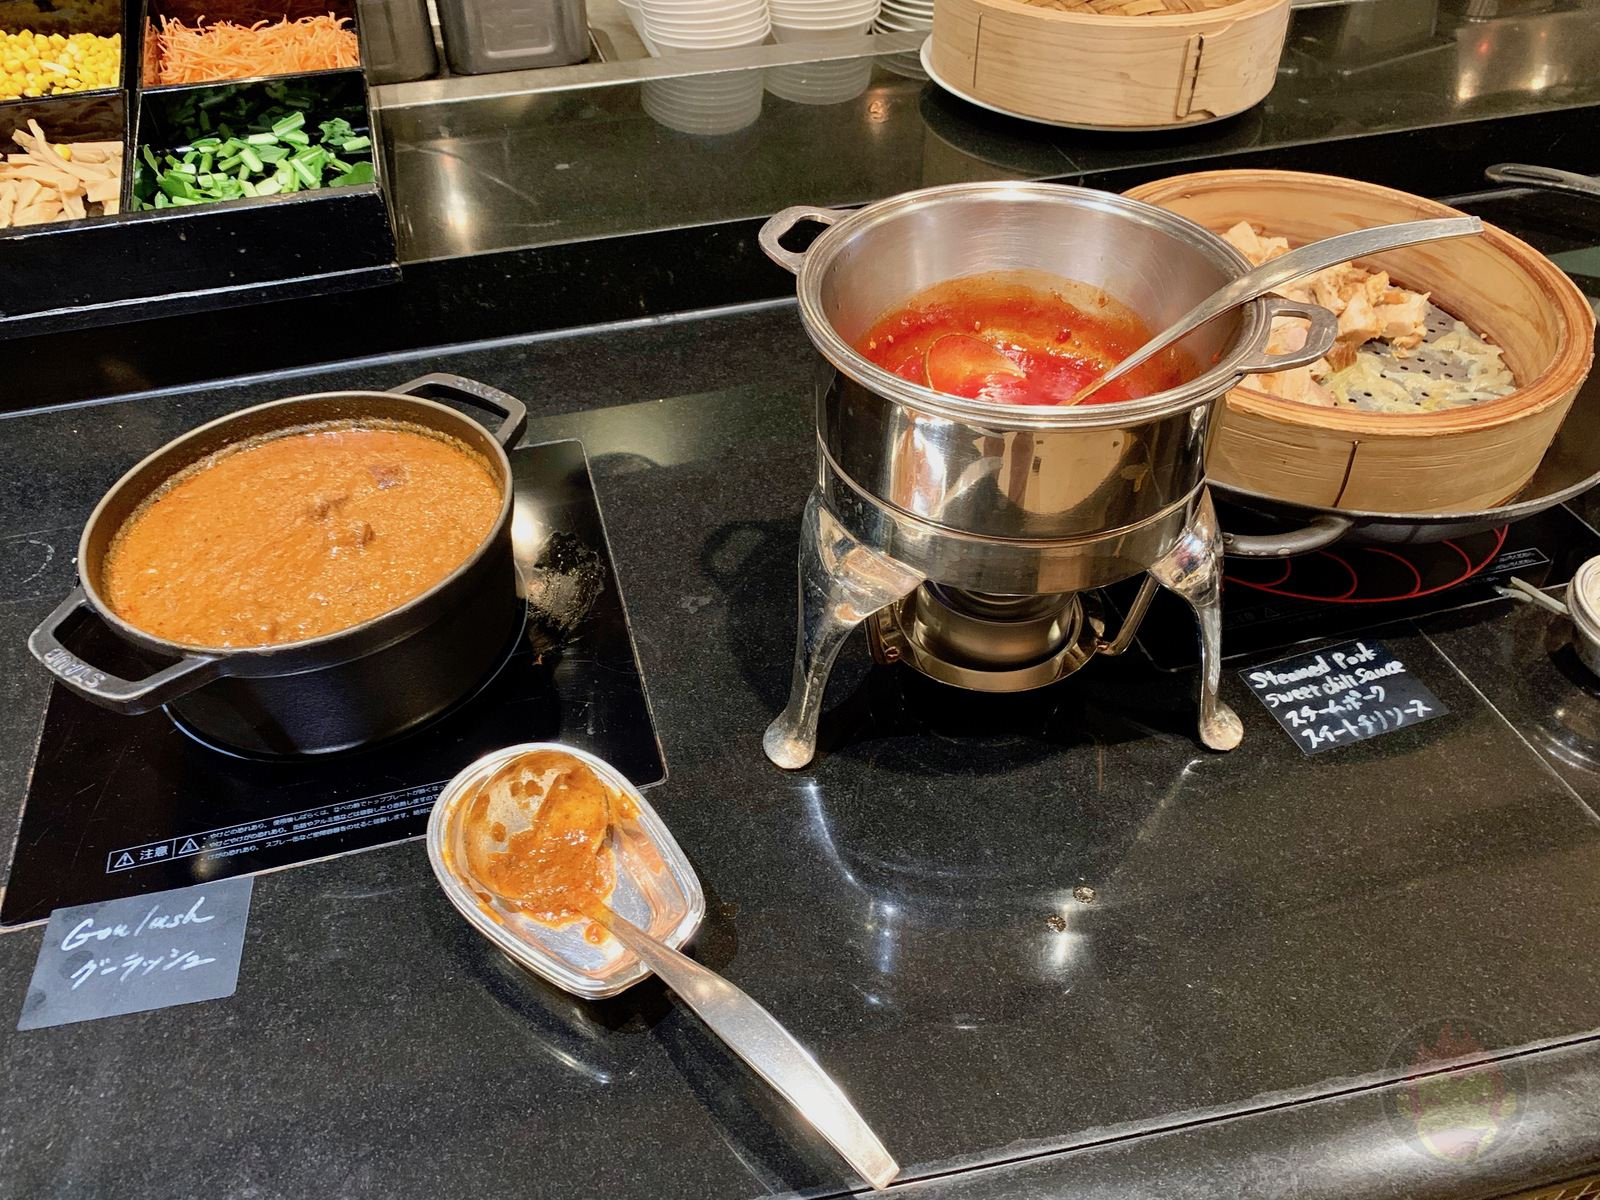 Westin tokyo theterrace lunch buffet 27